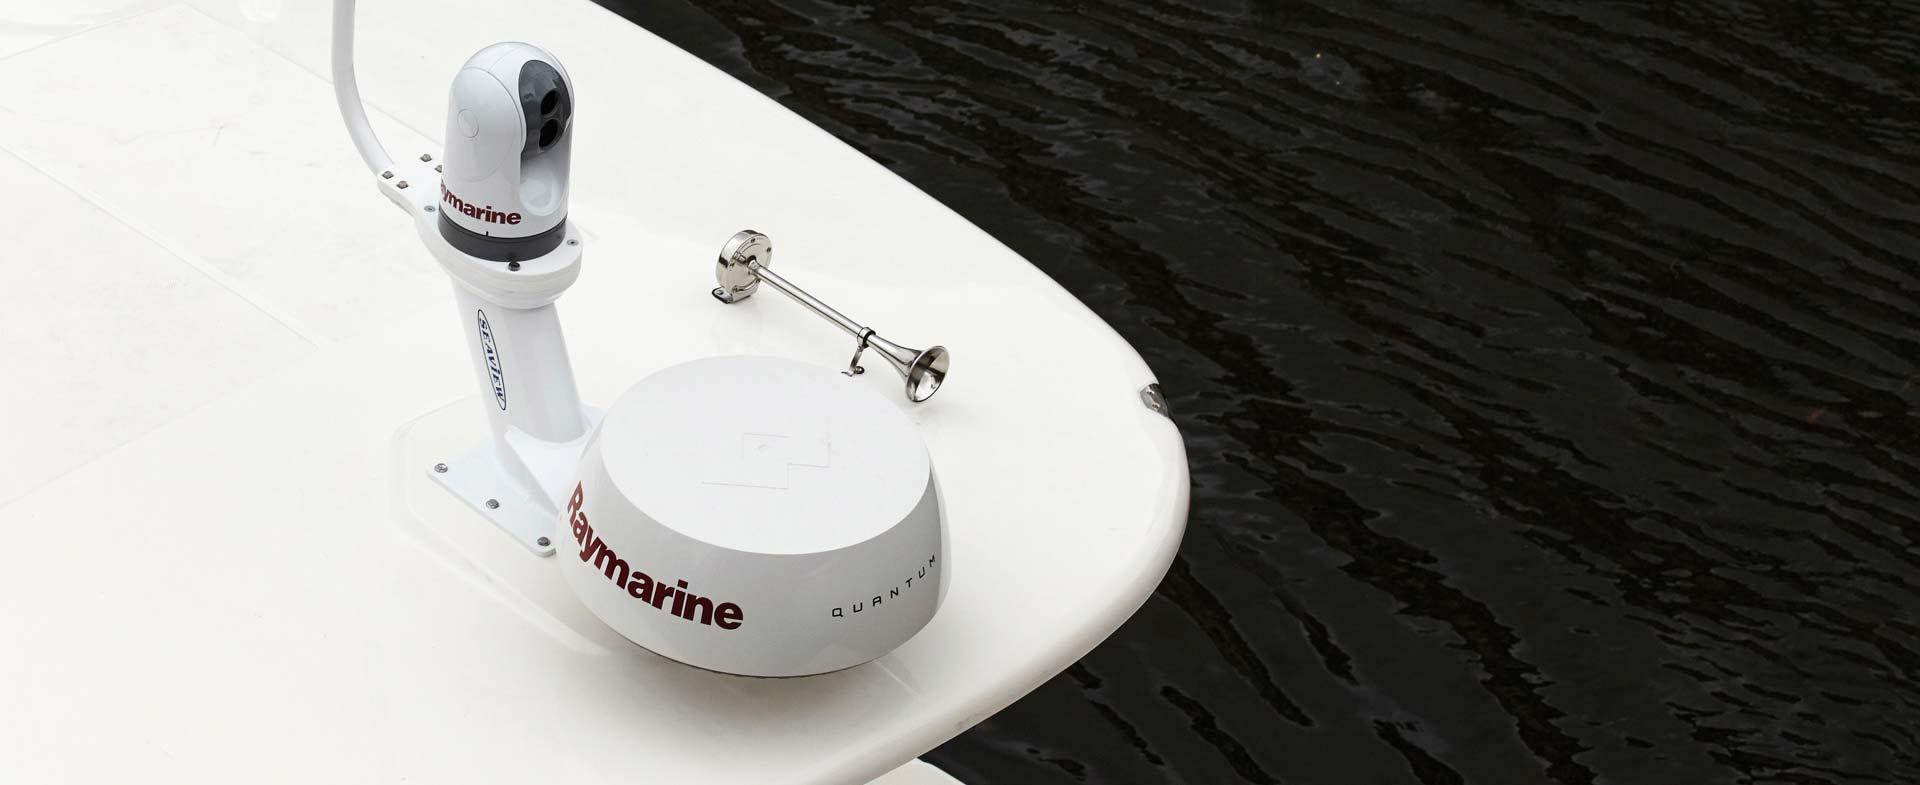 ELCOME Raymarine Quantum Wireless CHIRP Radar Flir Thermal Camera